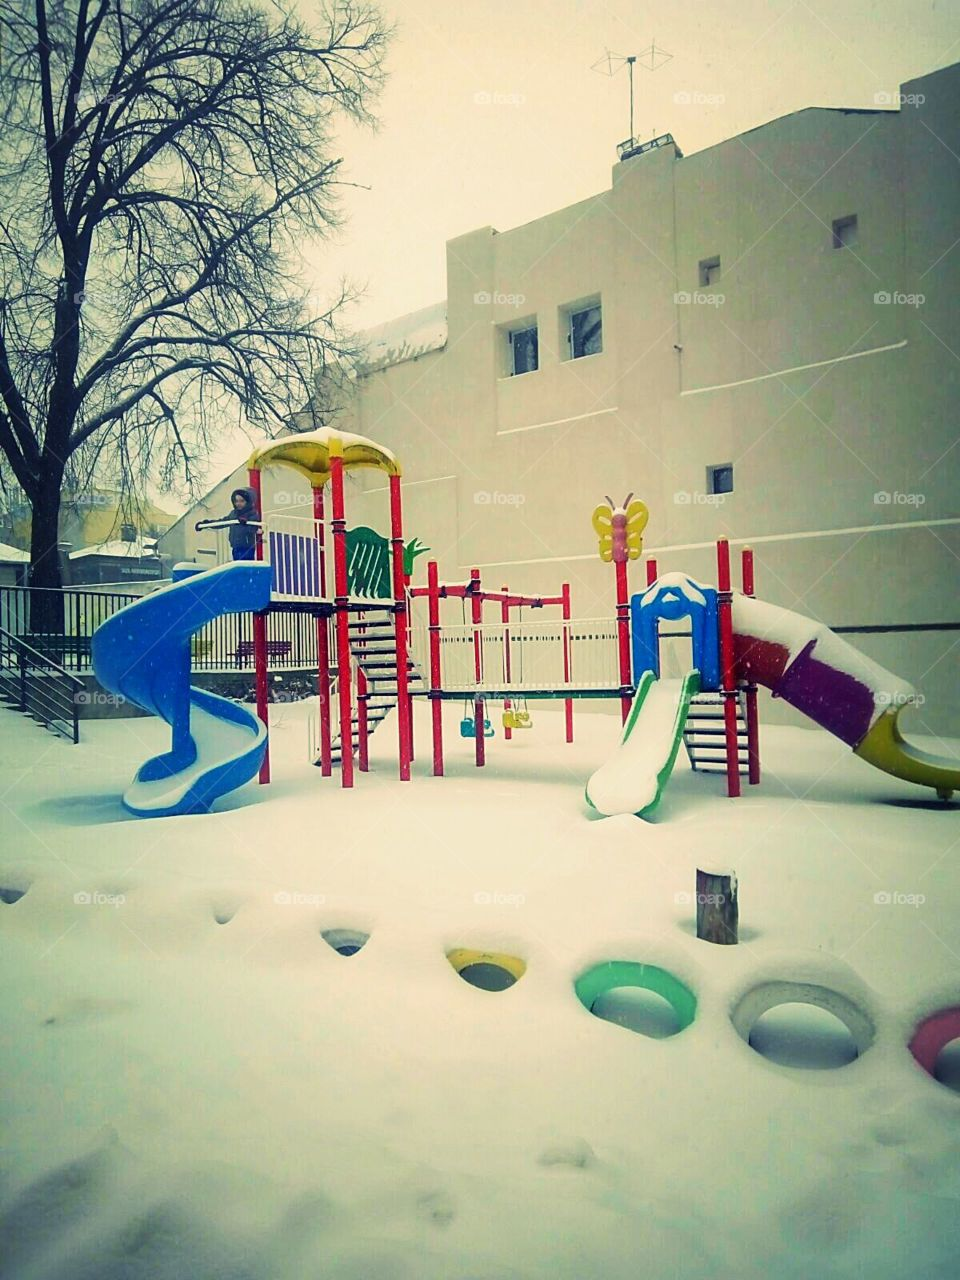 playground in winter